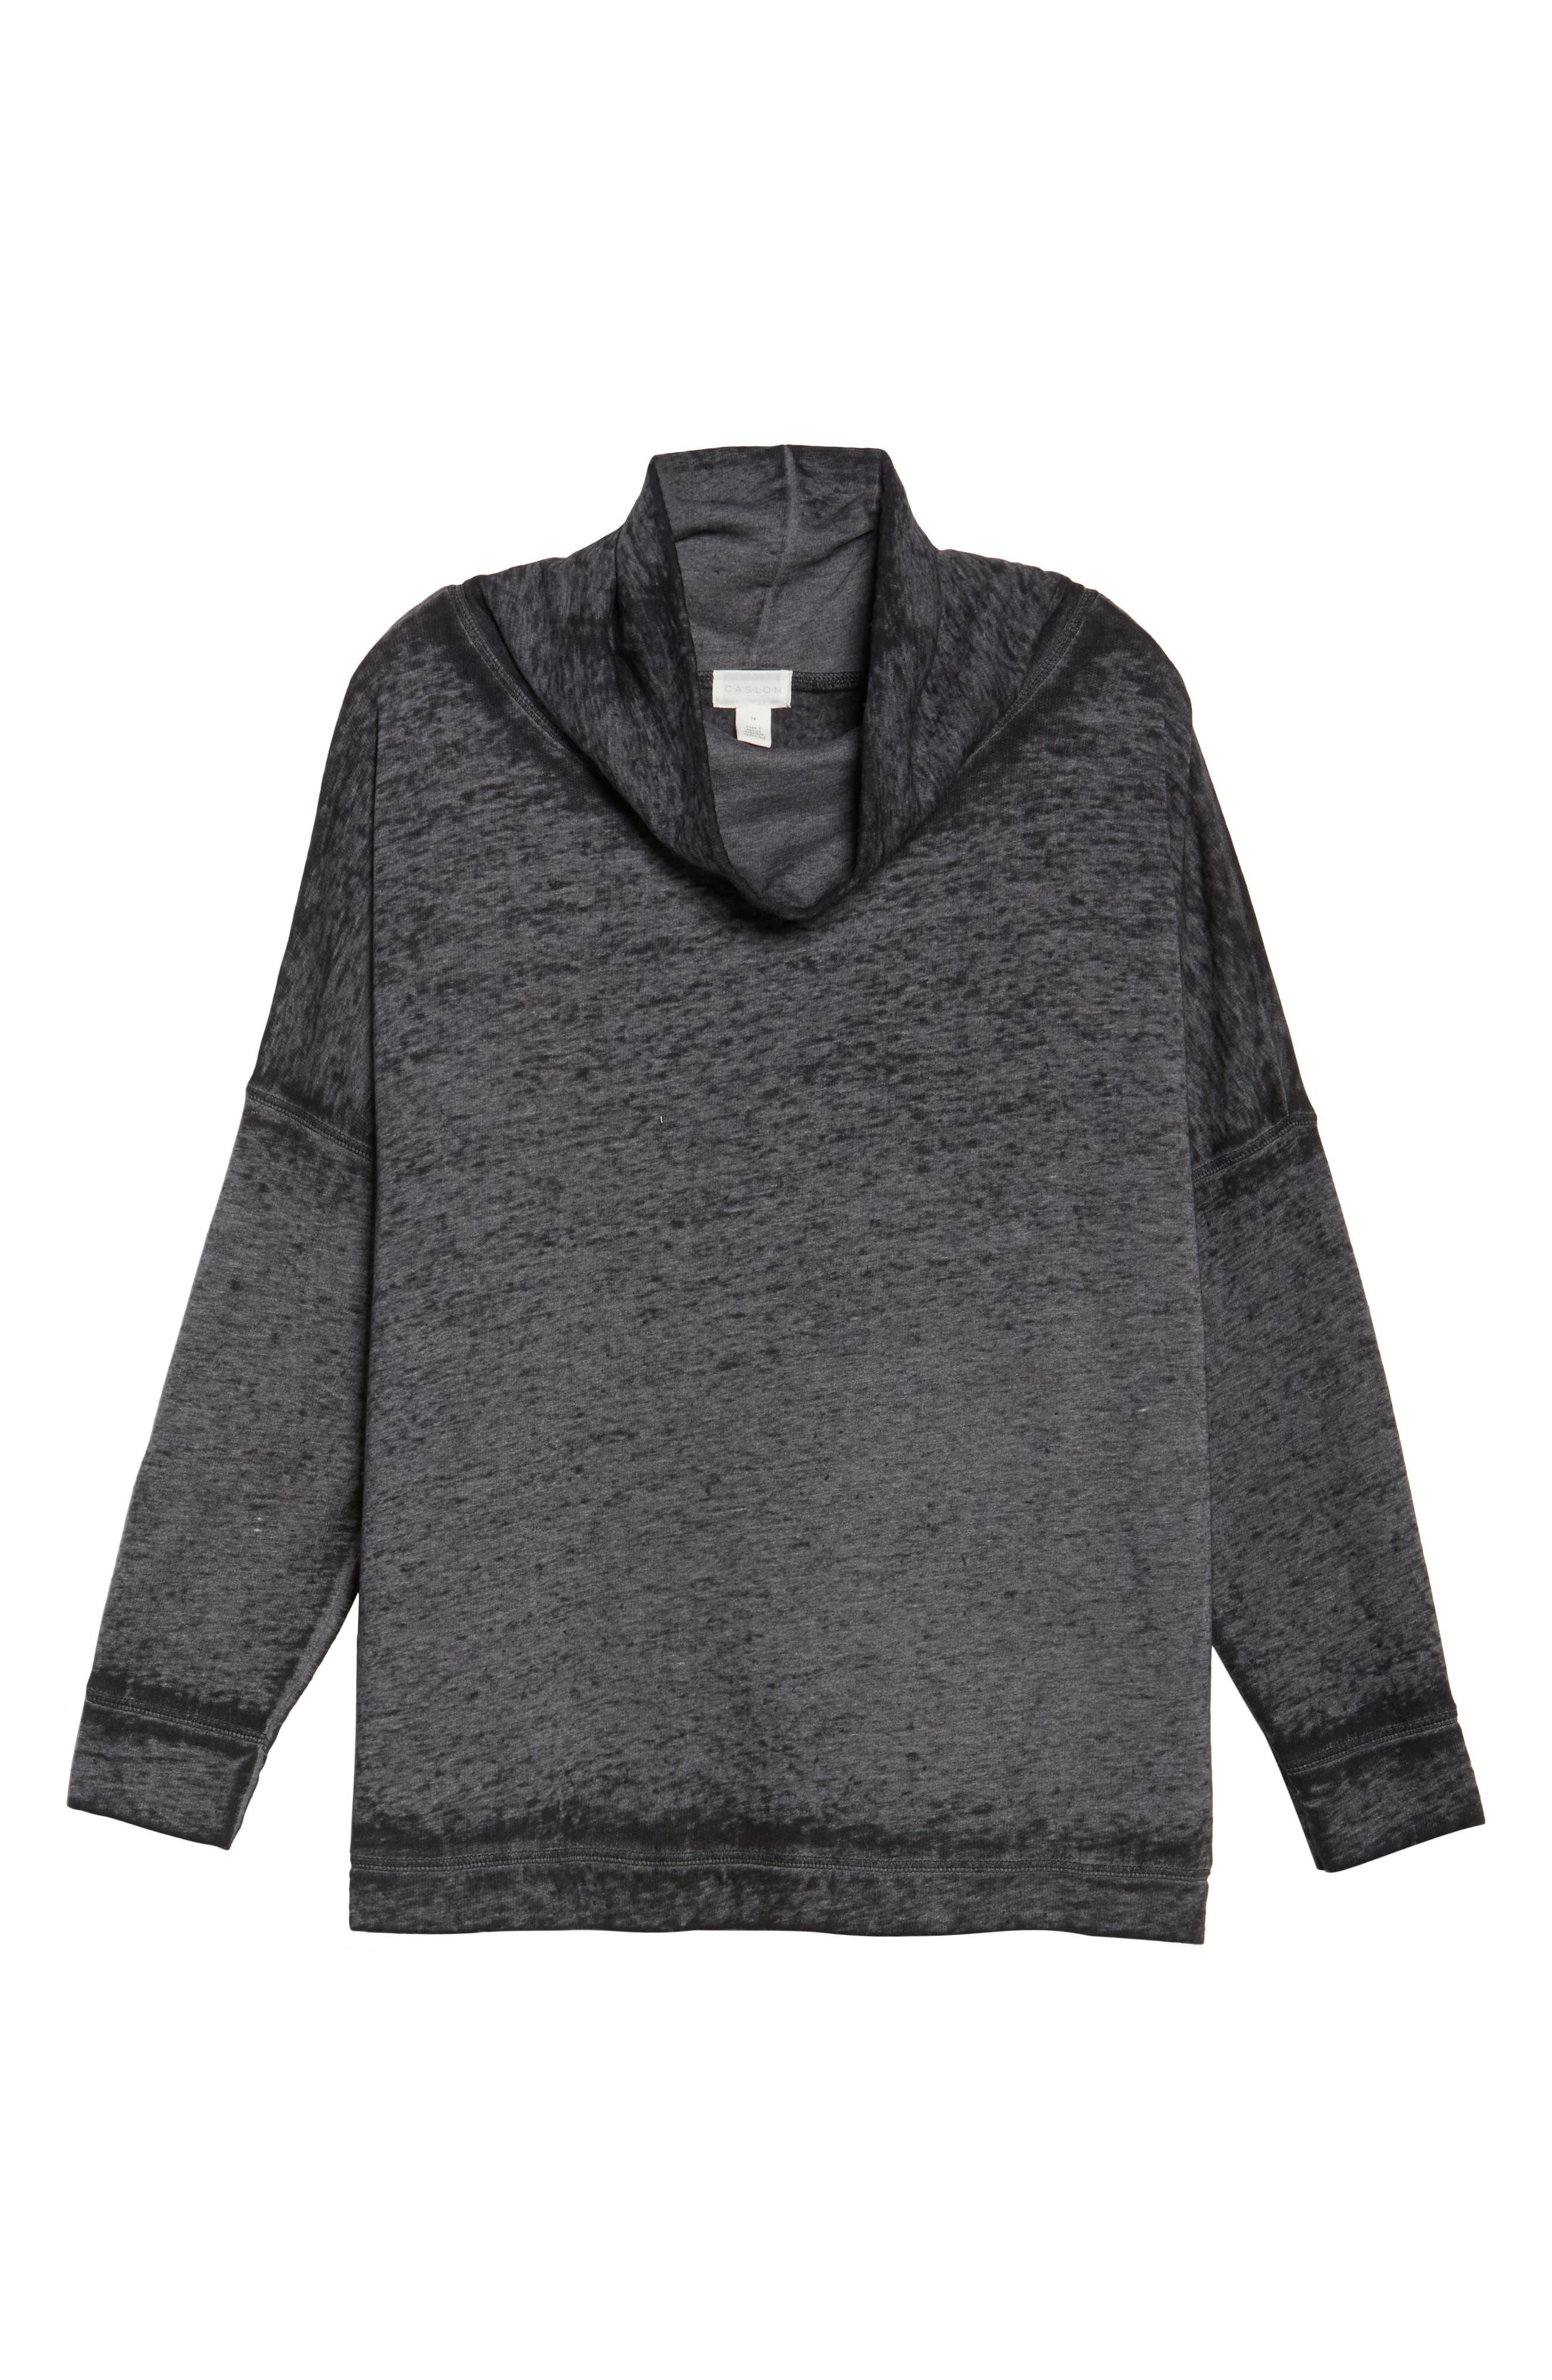 Pleat Back Sweatshirt,                             Alternate thumbnail 6, color,                             001